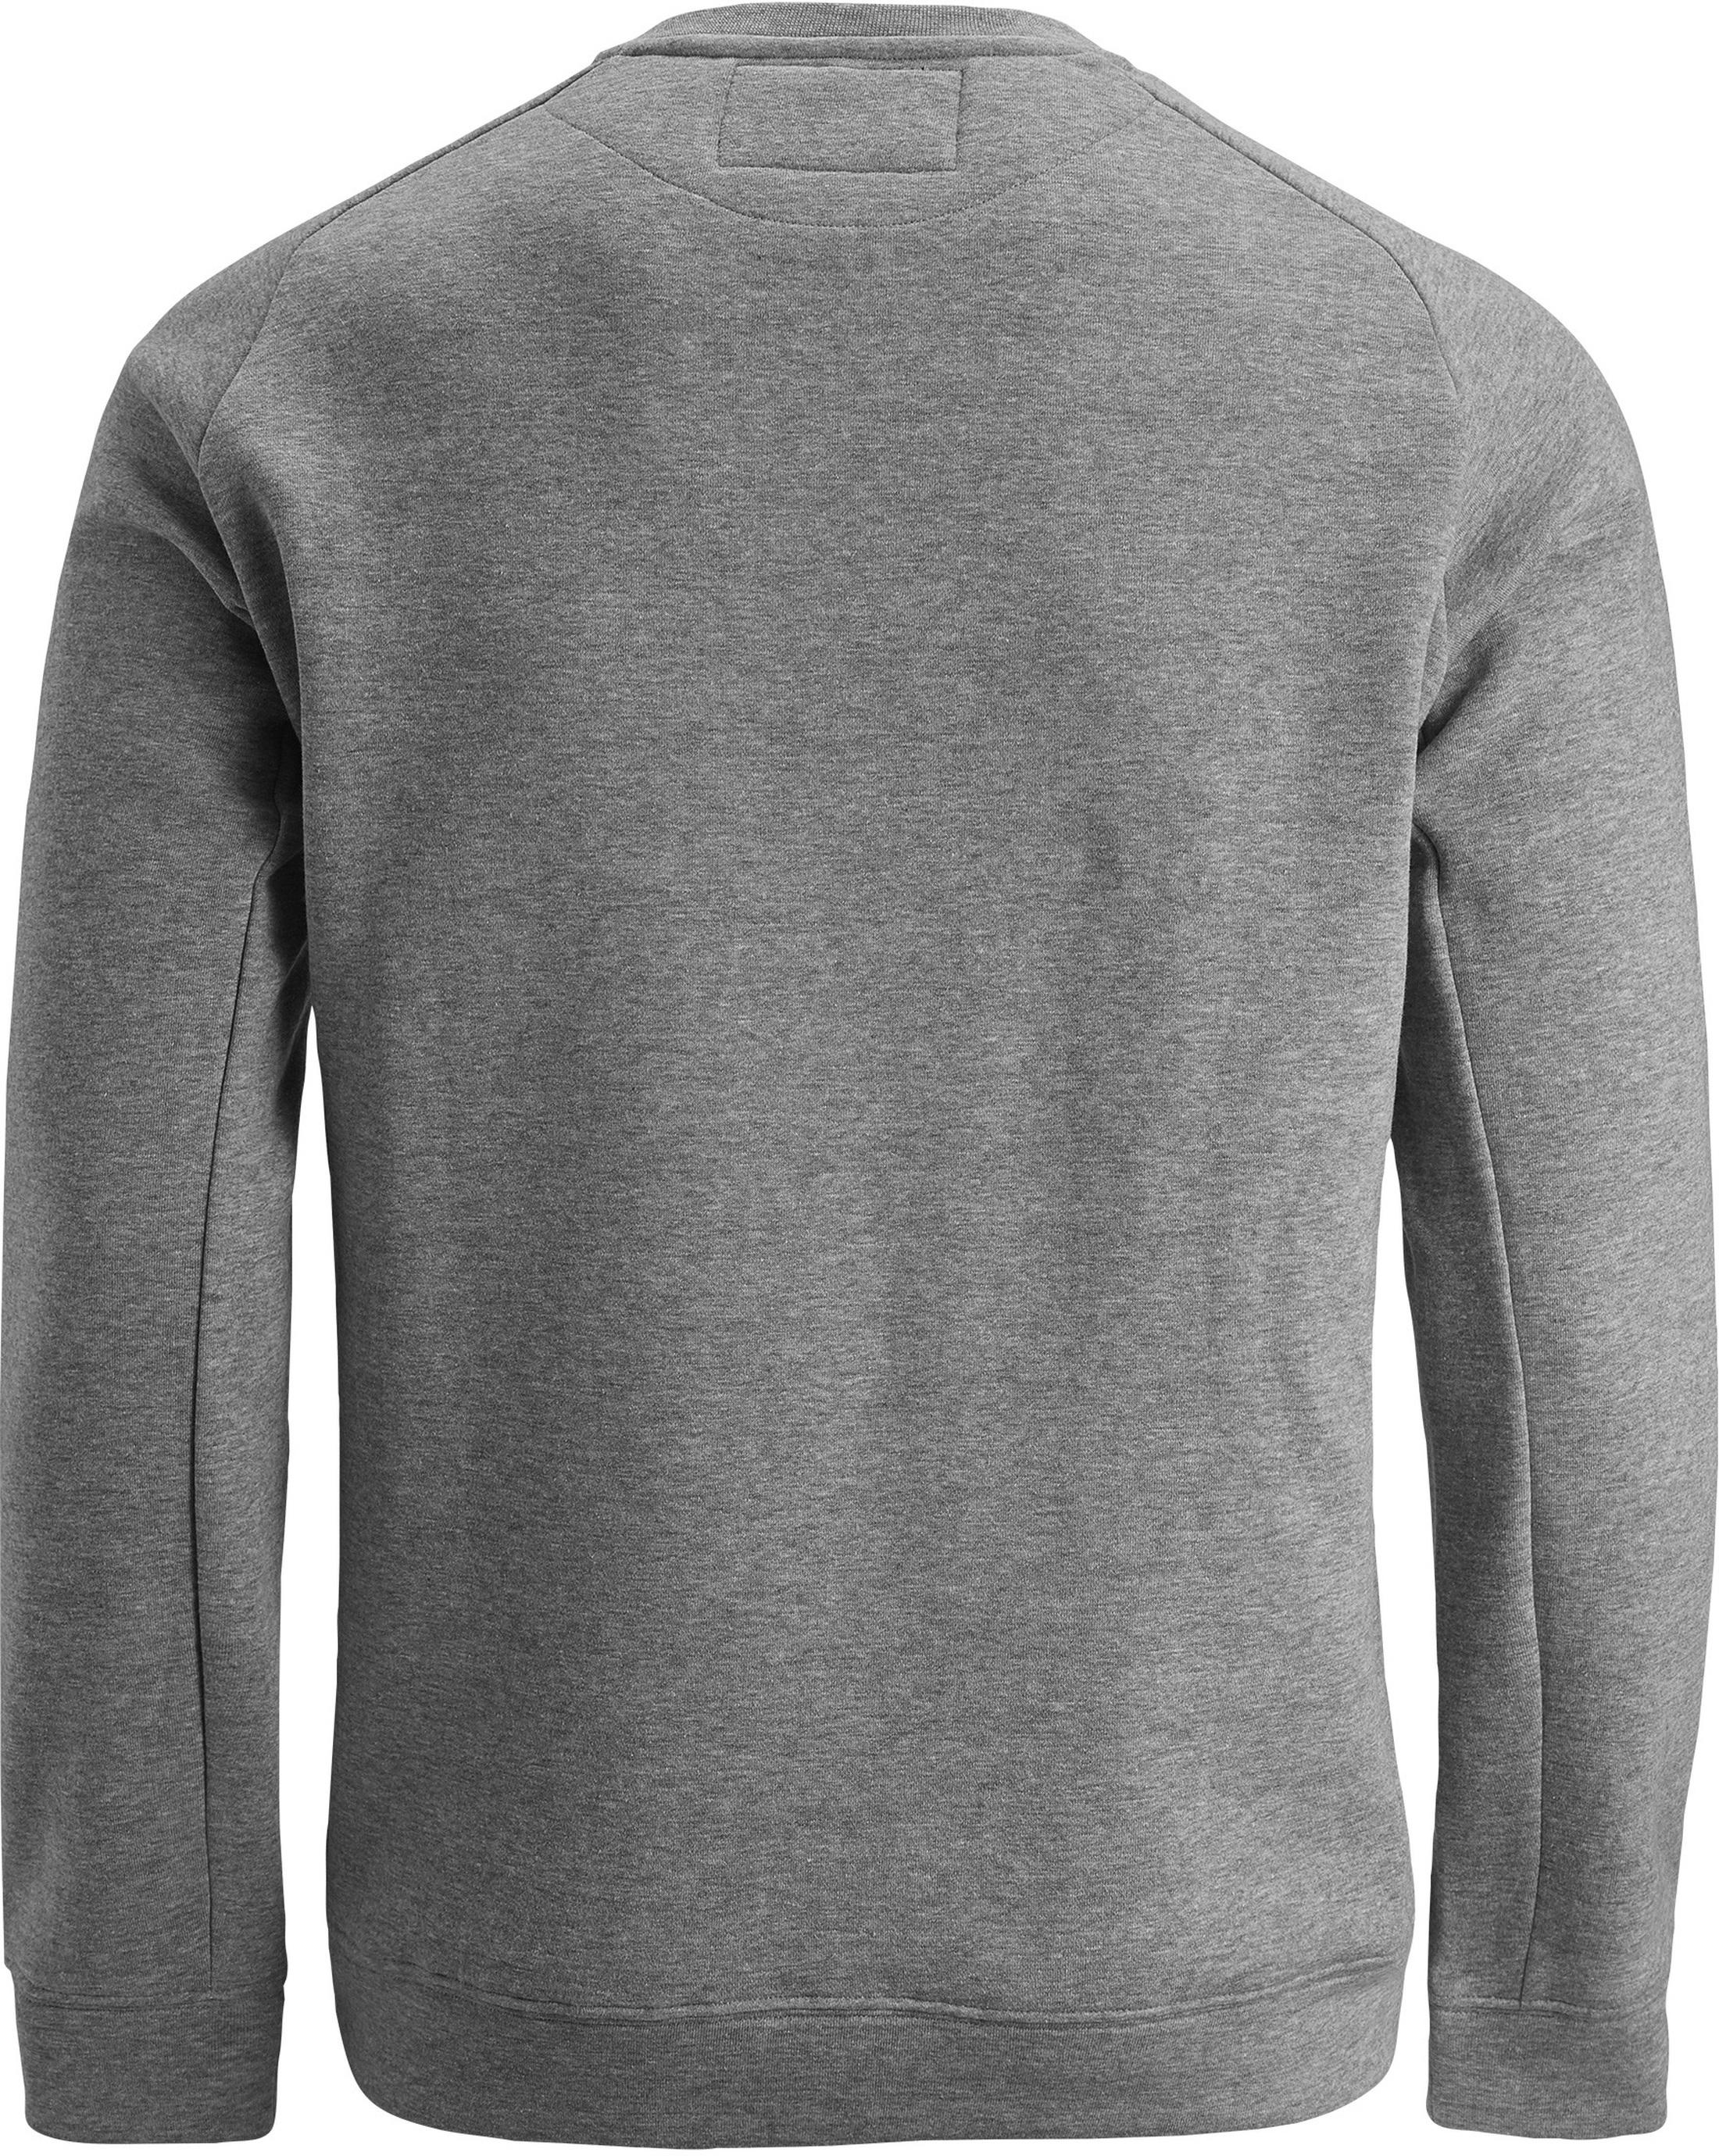 Bjorn Borg Sweater Melange Grey foto 2